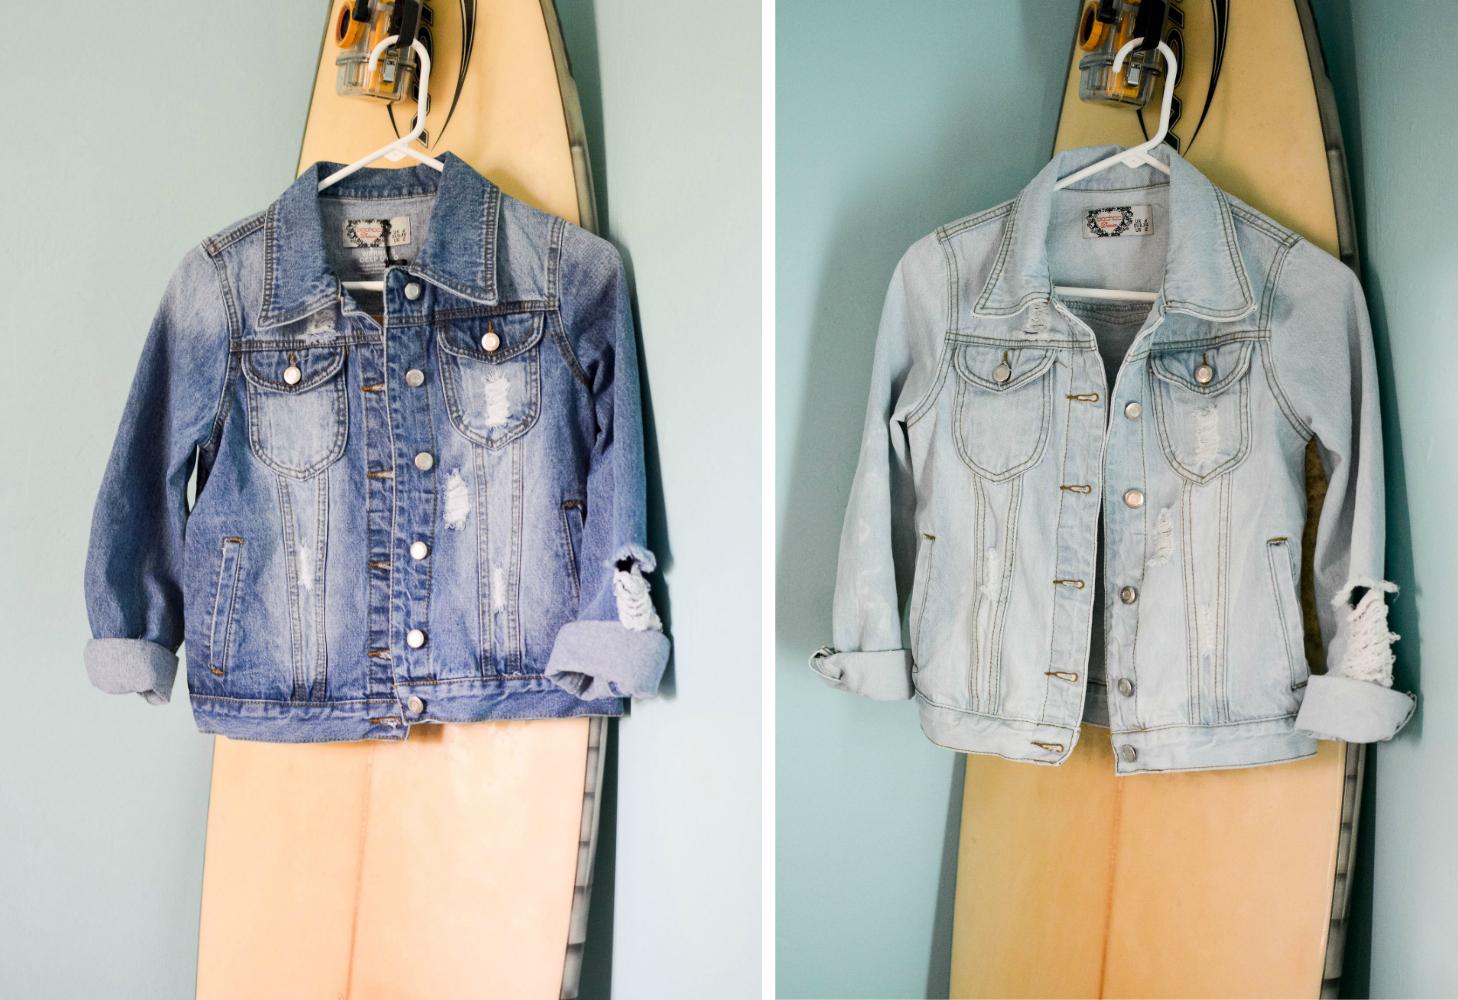 How to bleach a denim jacket